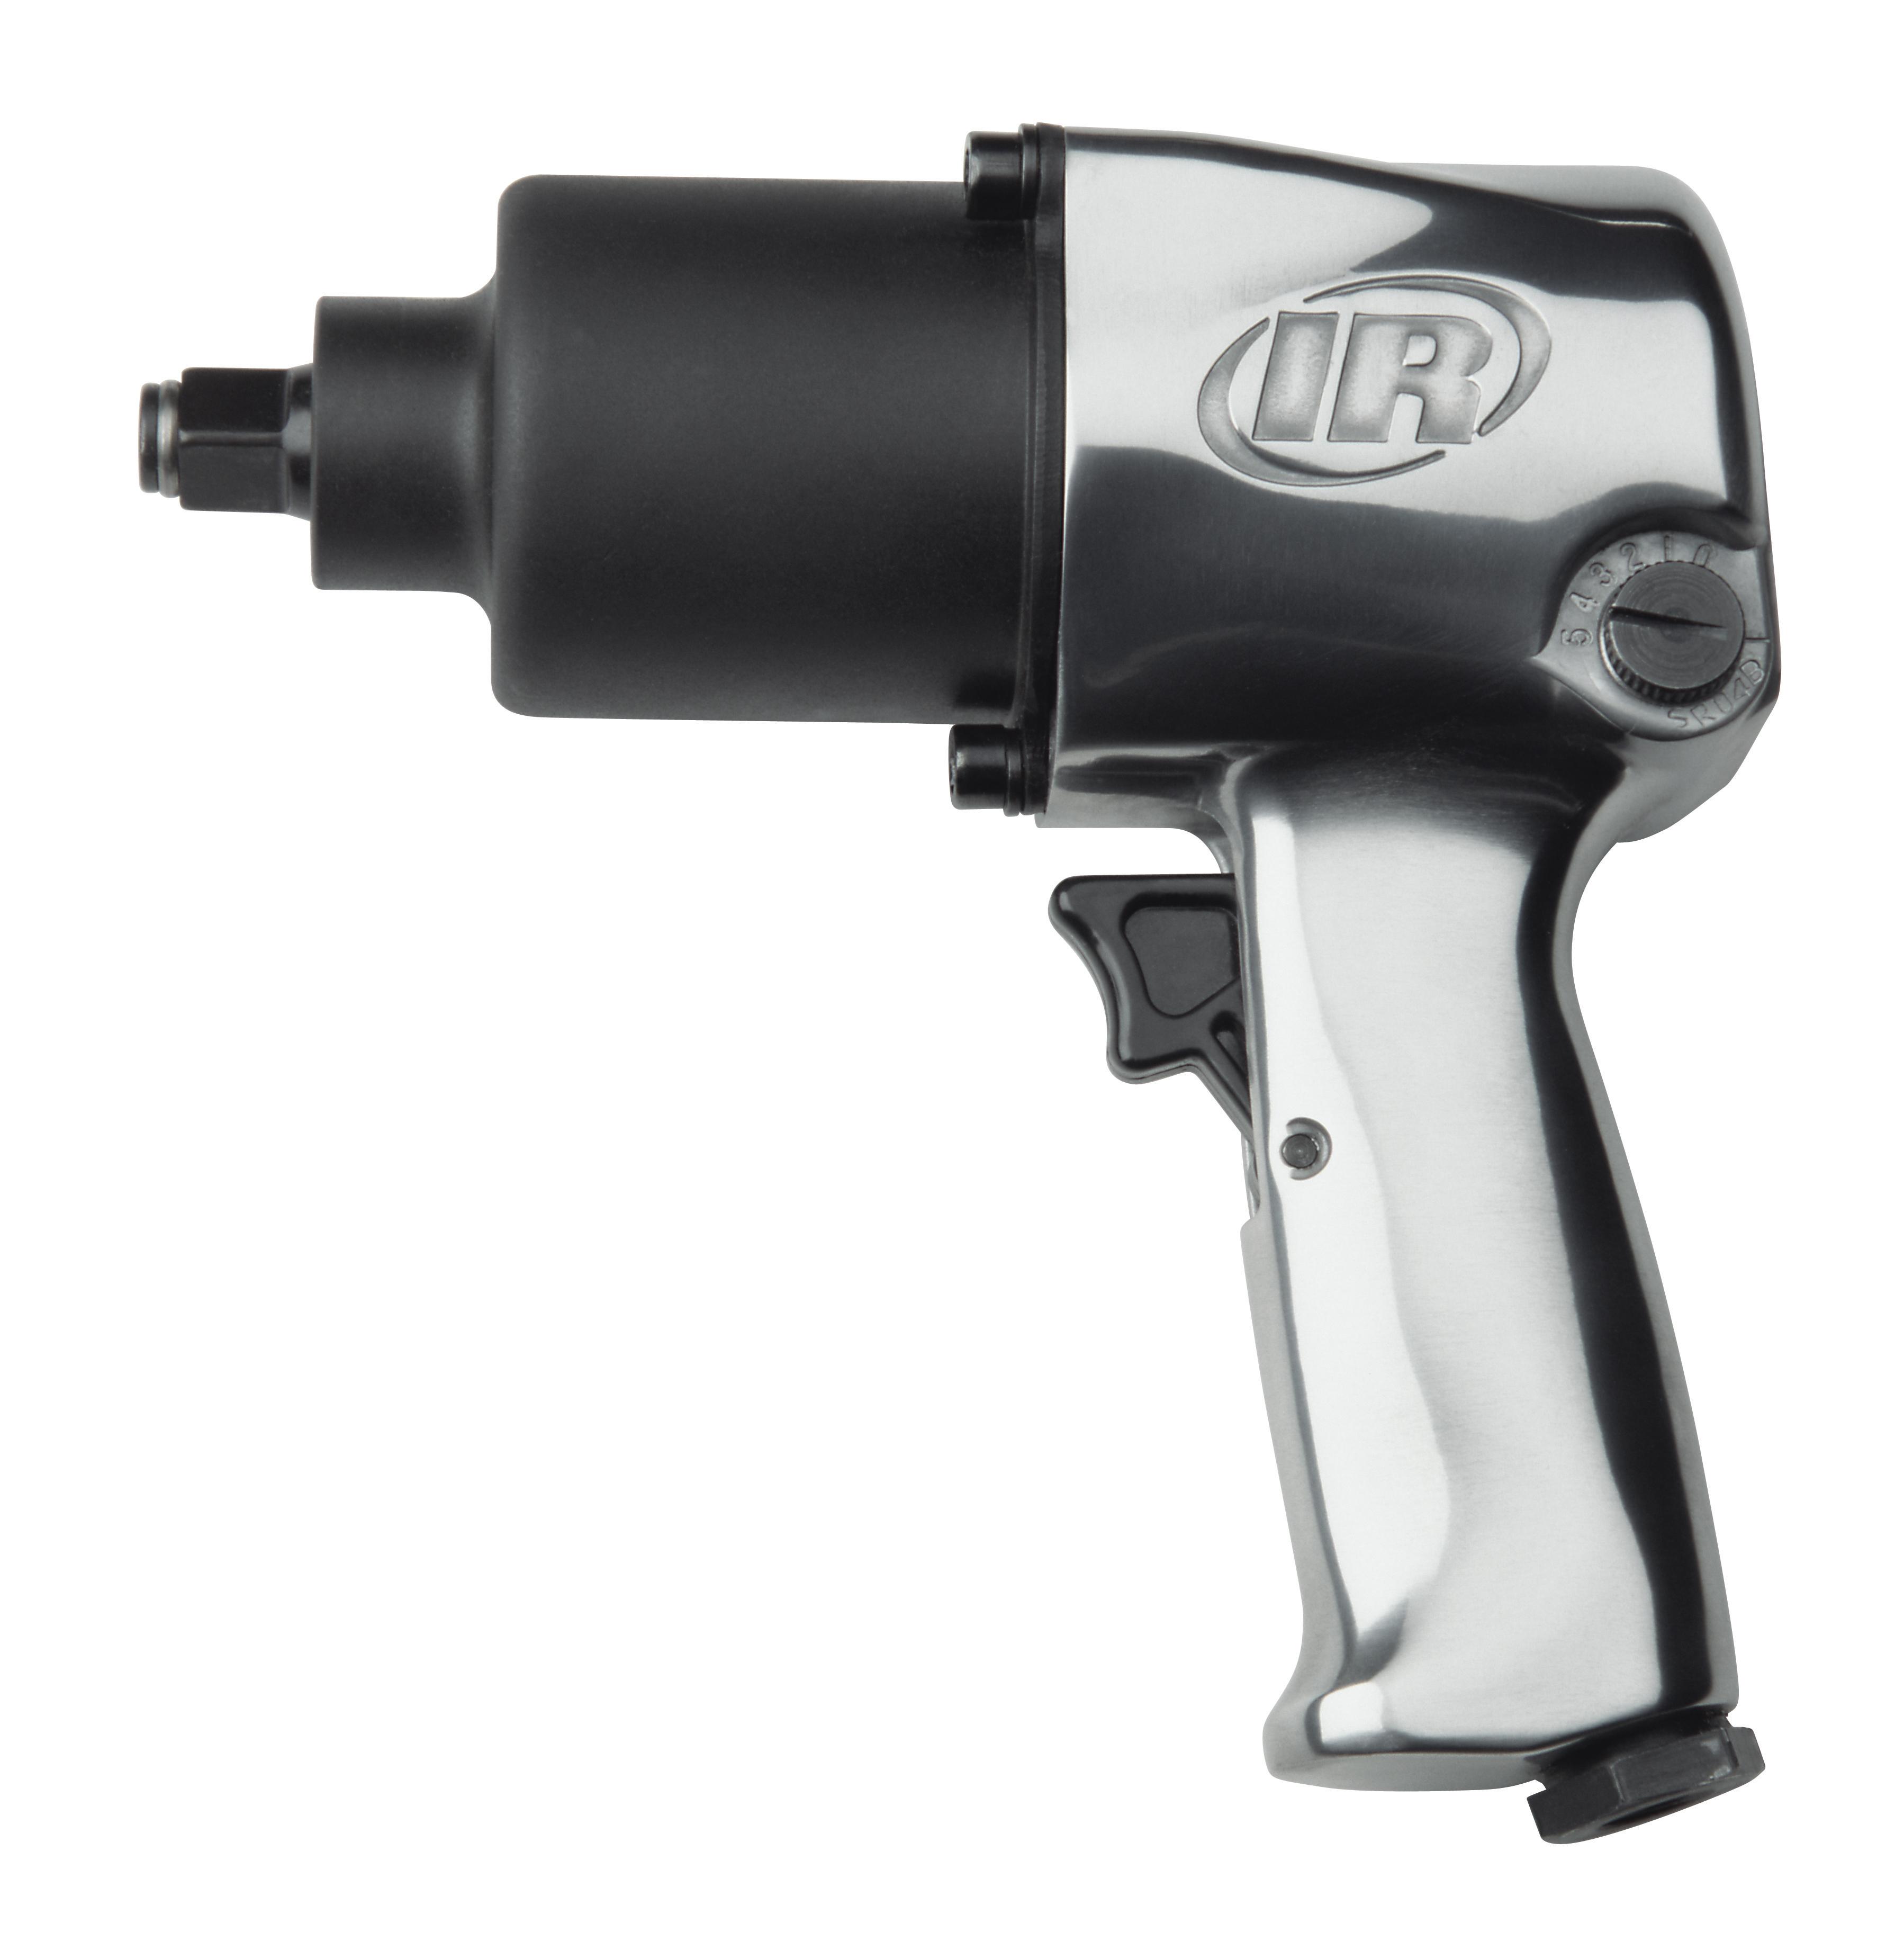 Ingersoll Rand 231c 1 2 Quot Air Impact Gun Wrench Tool